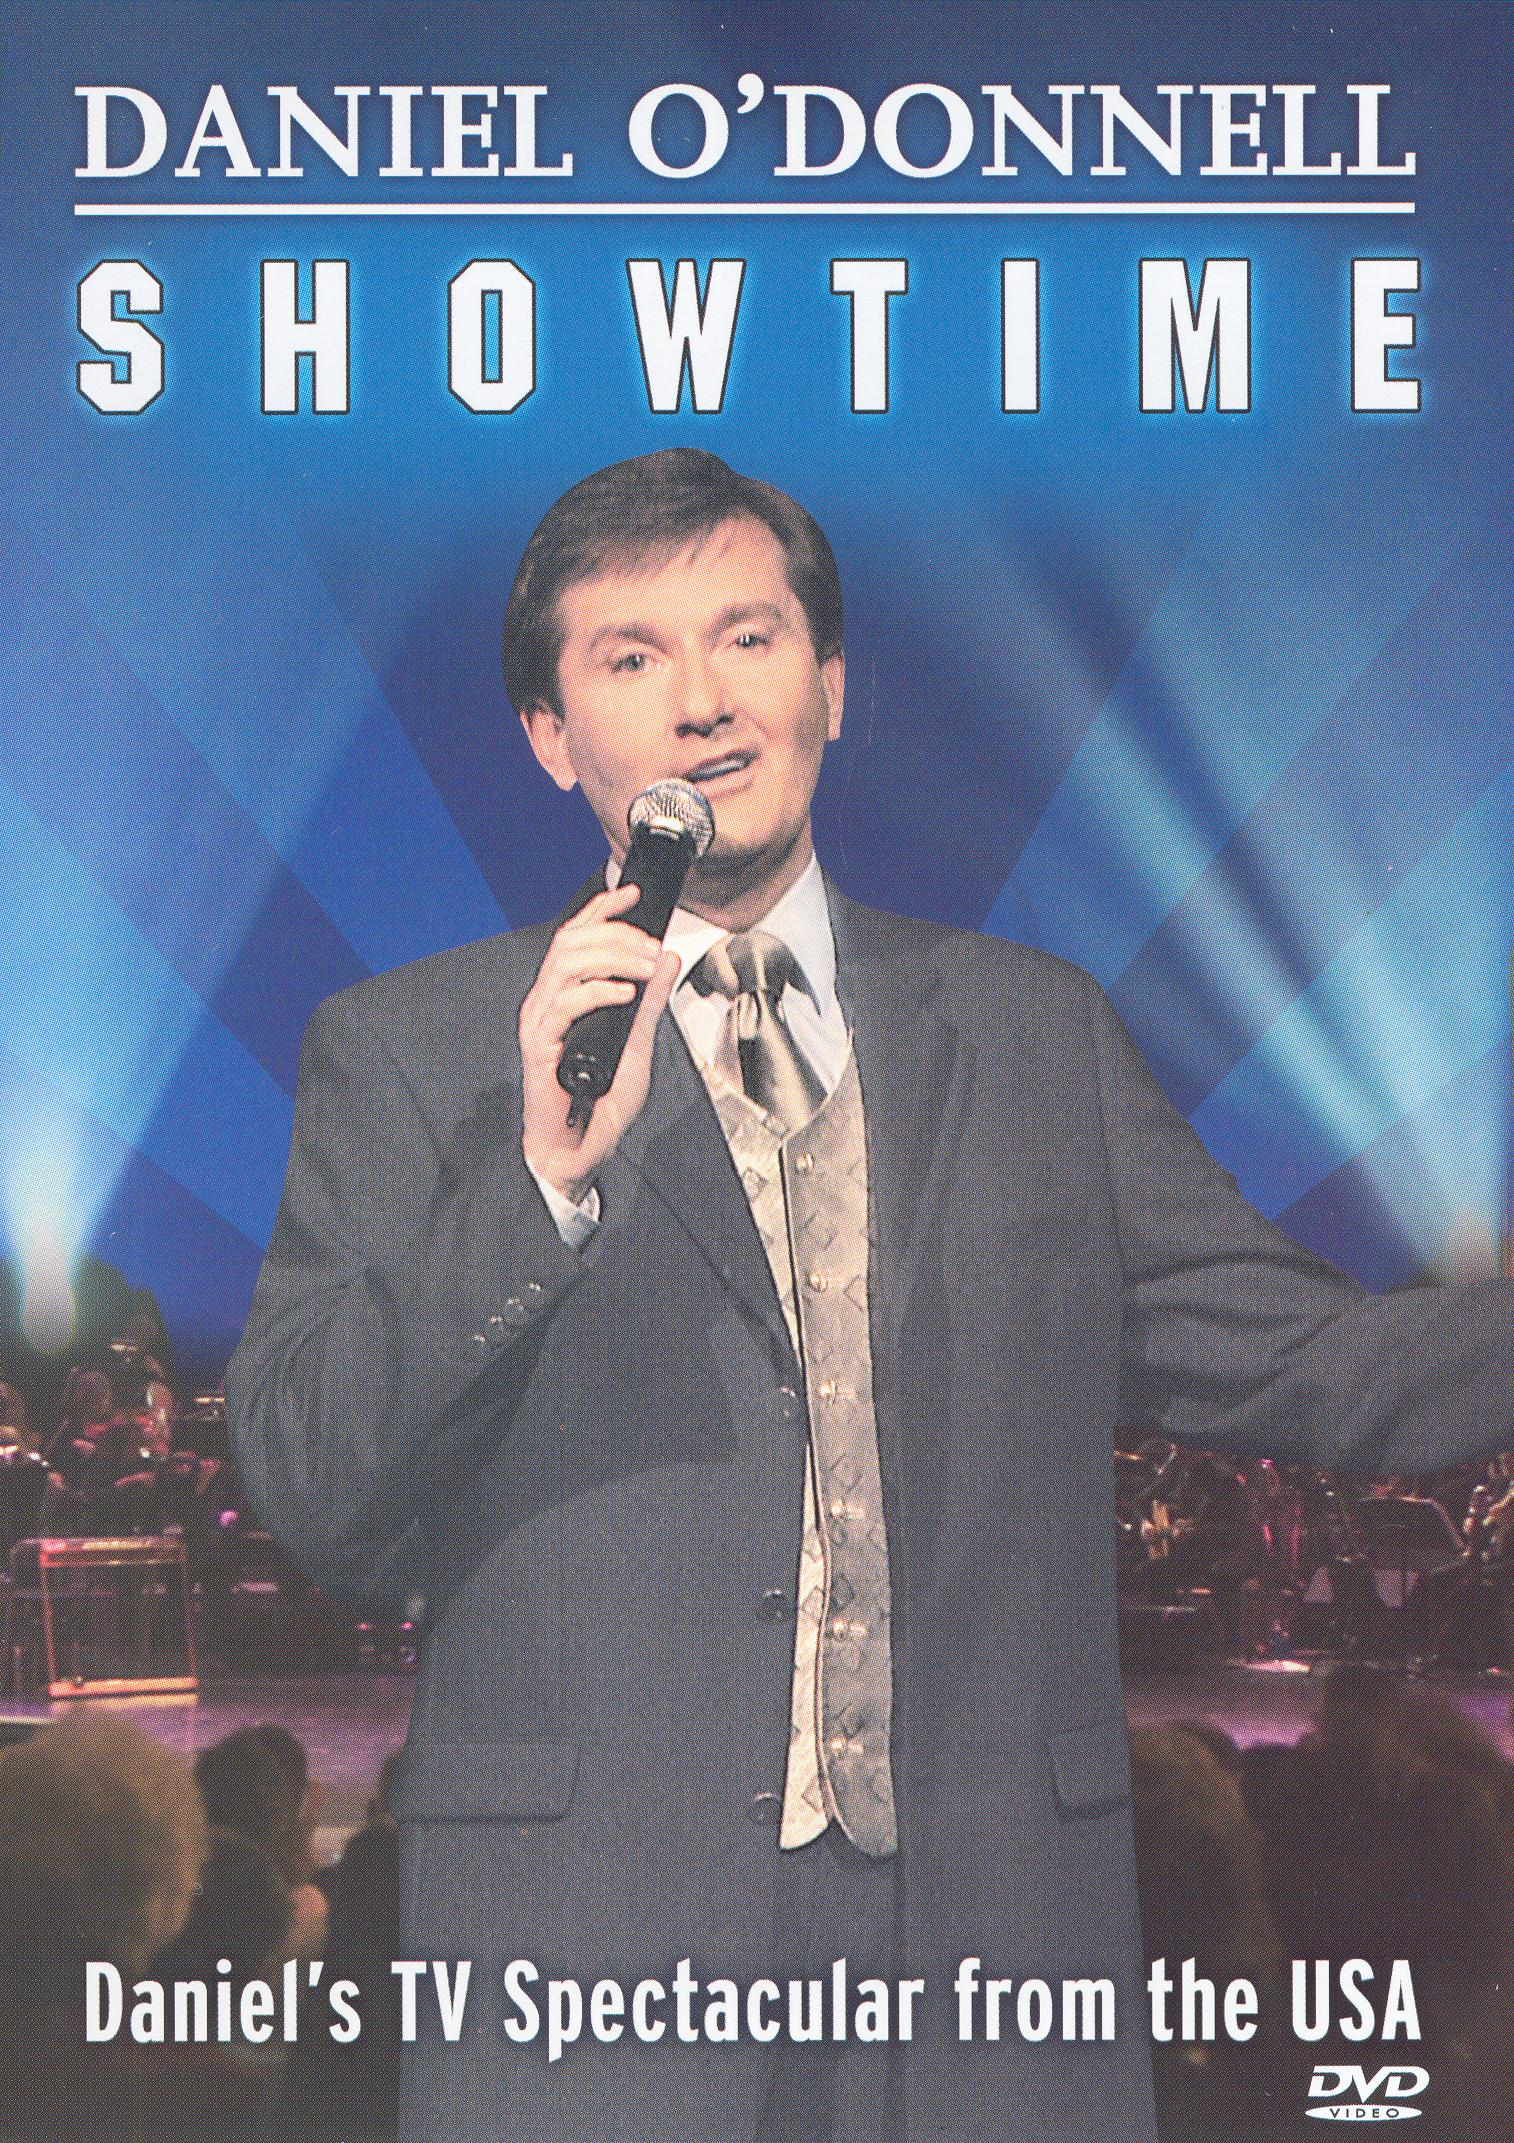 Daniel O'Donnell: Showtime